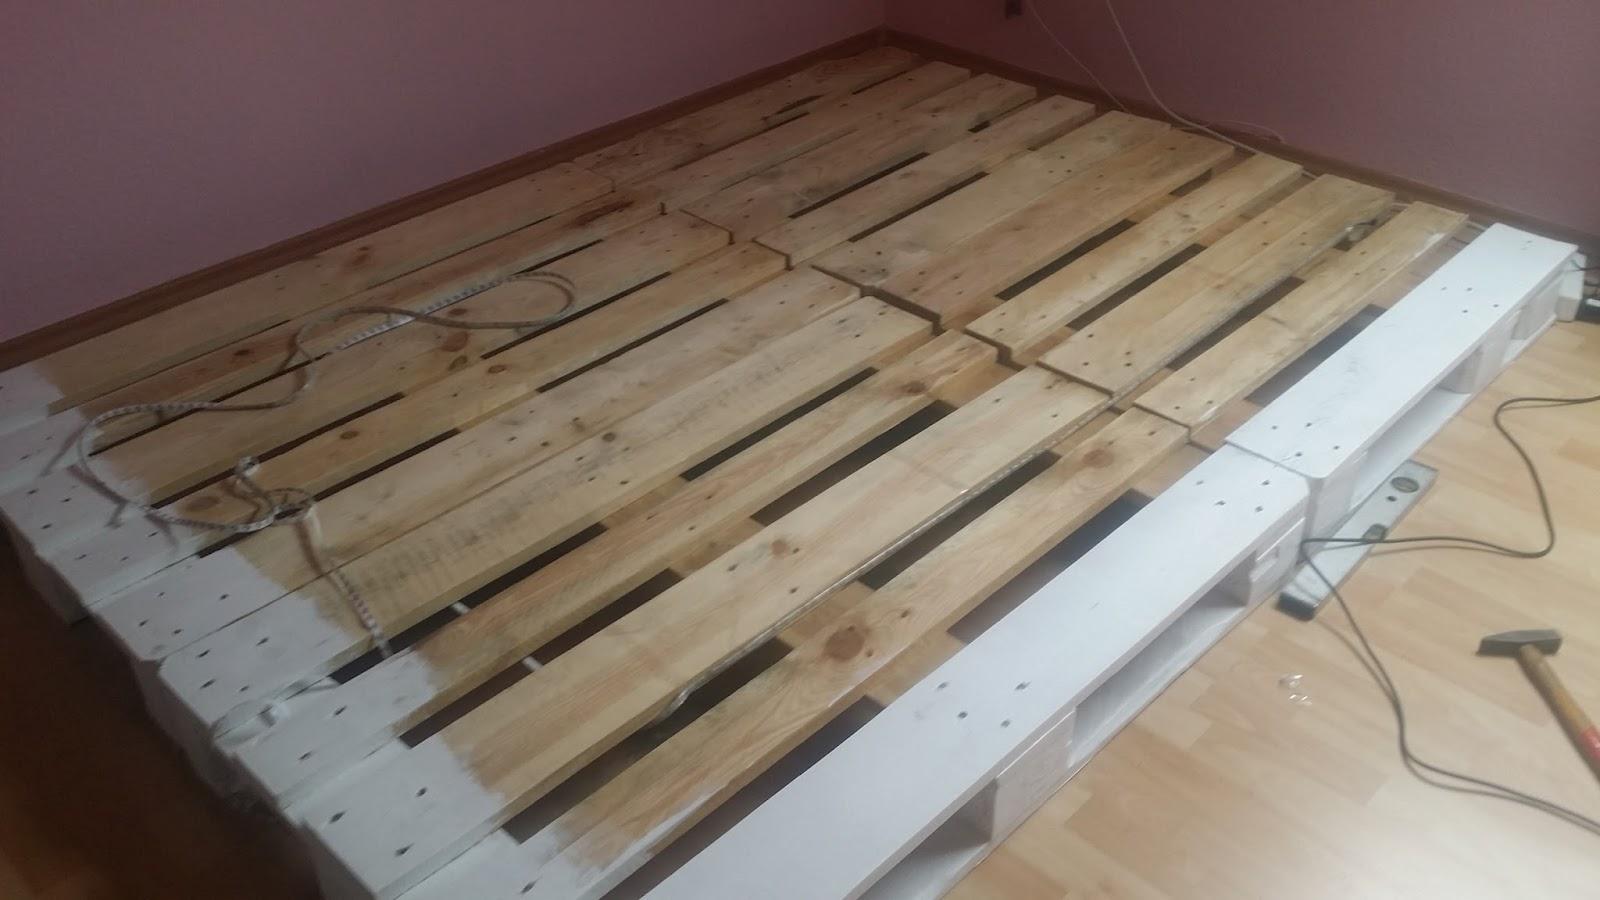 badezimmerschrank selber bauen. Black Bedroom Furniture Sets. Home Design Ideas